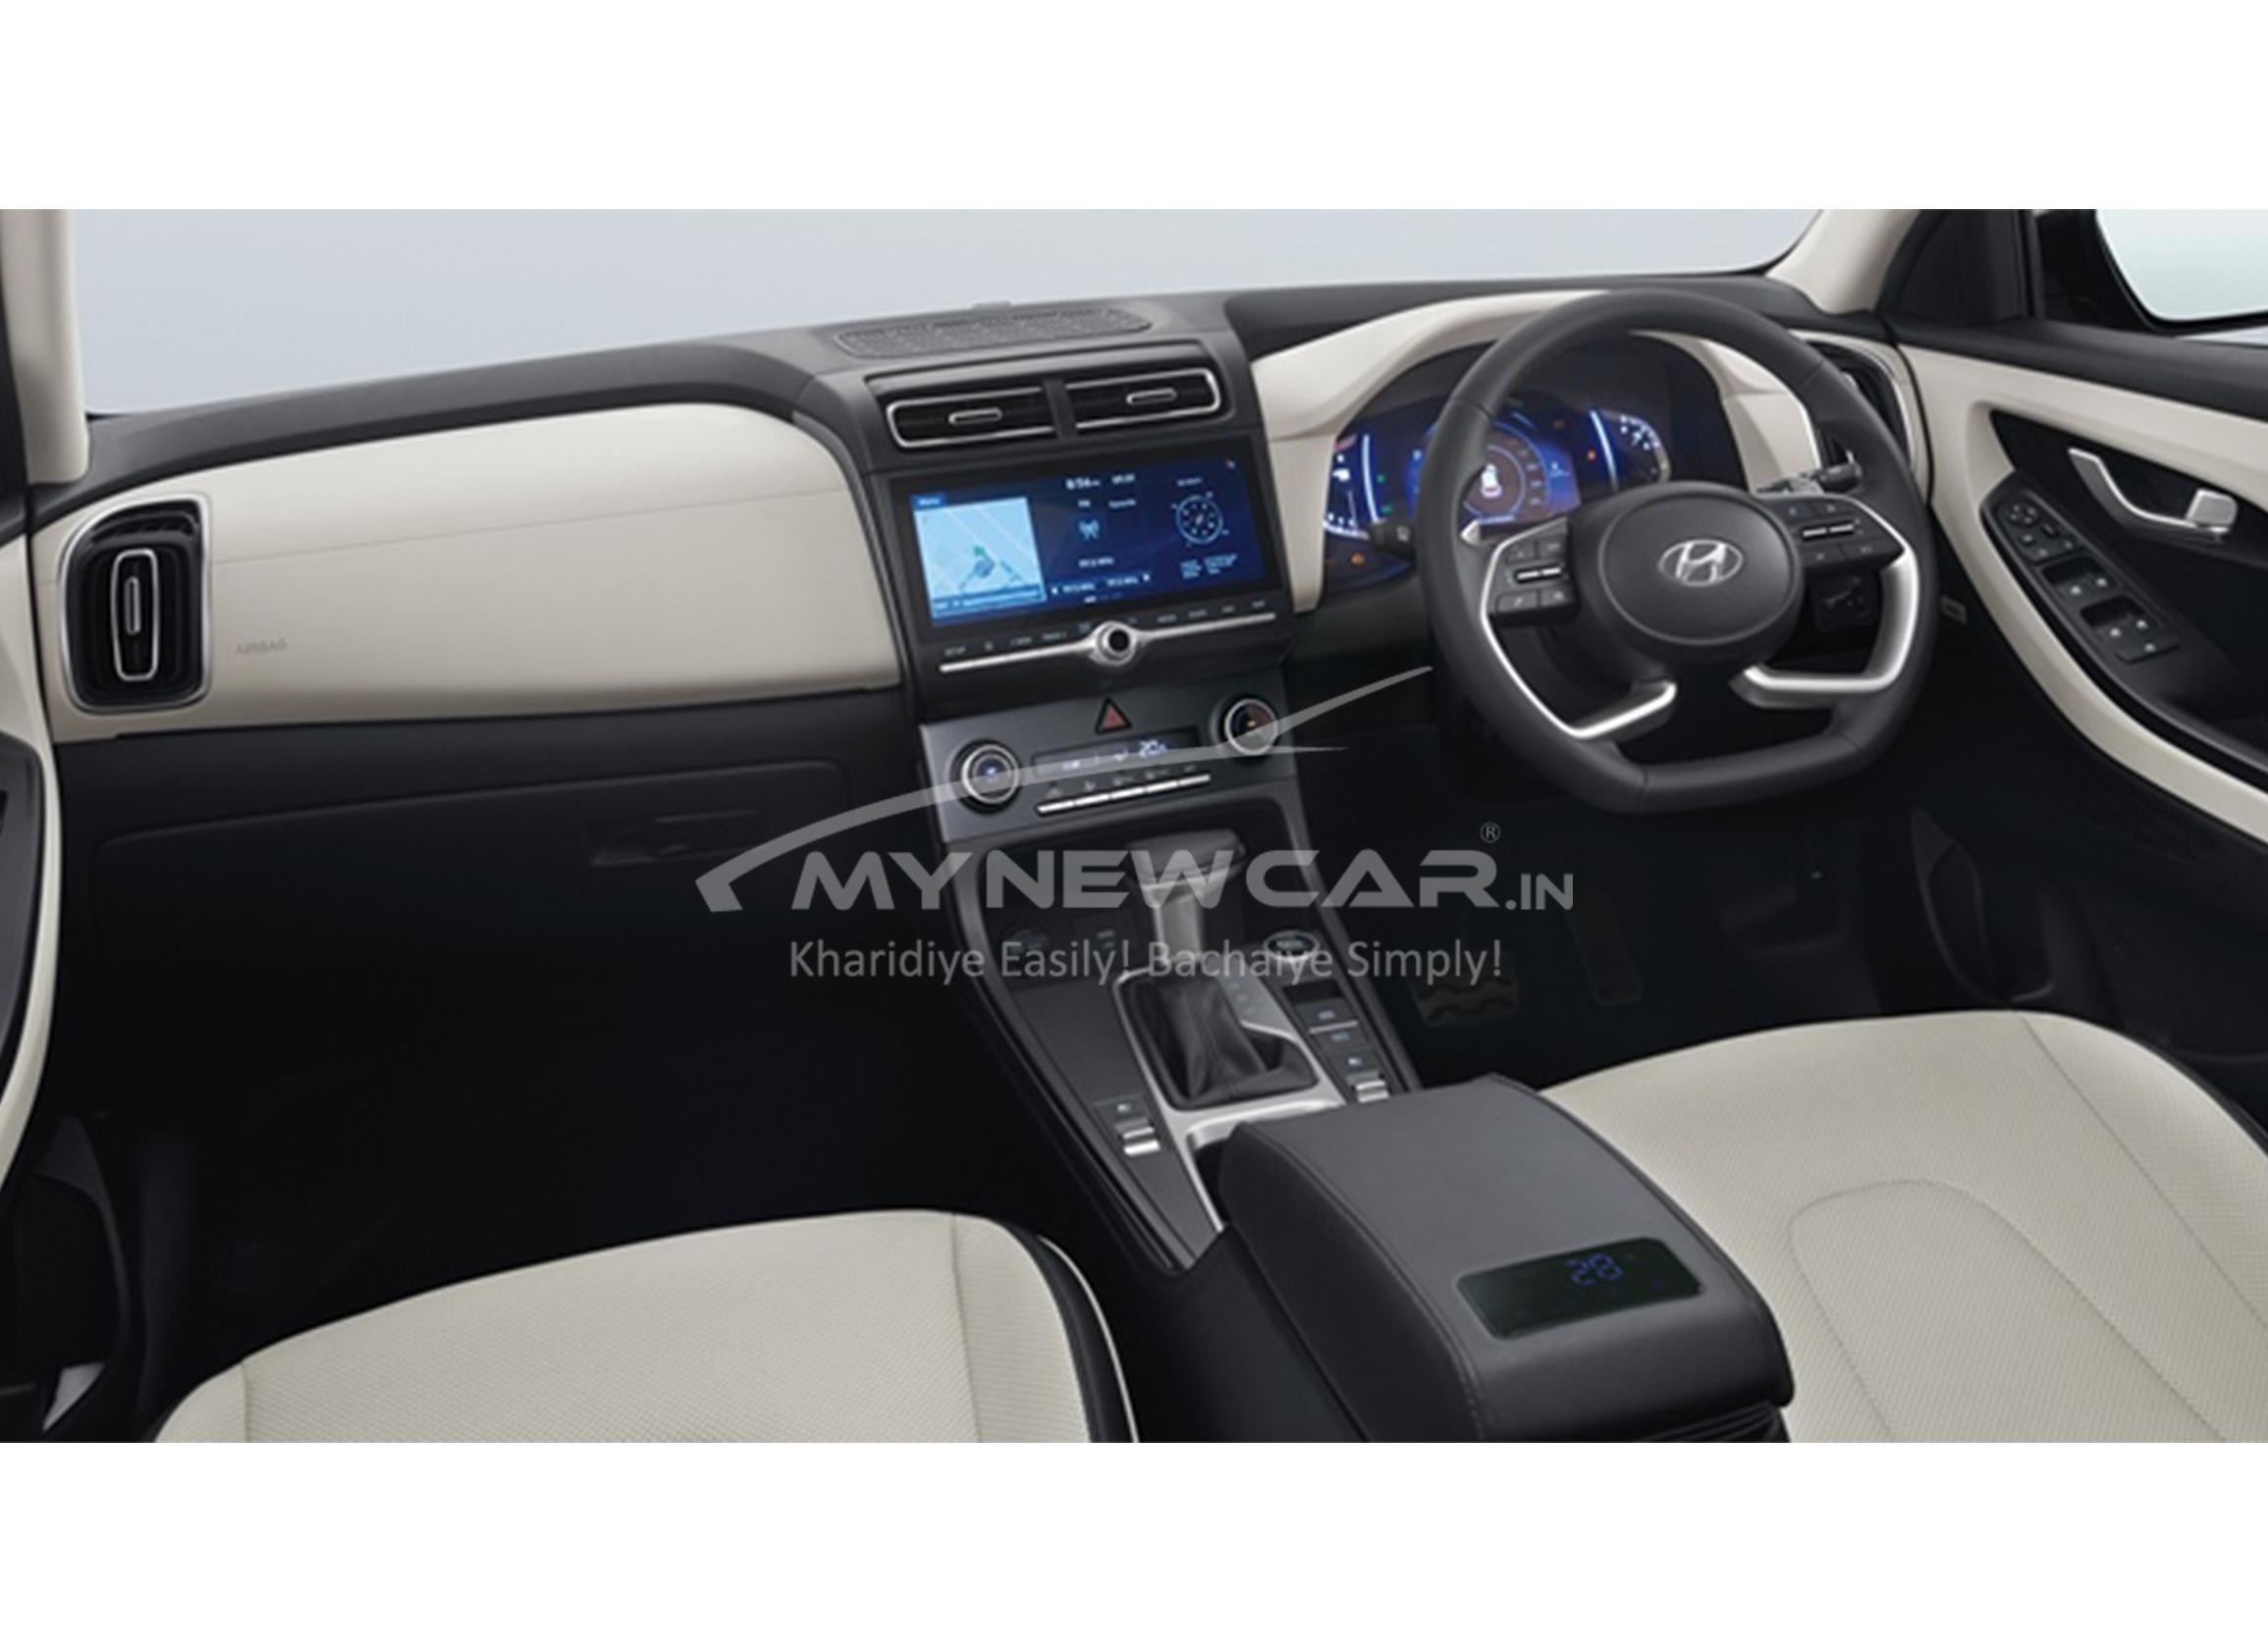 Hyundai creta interior image